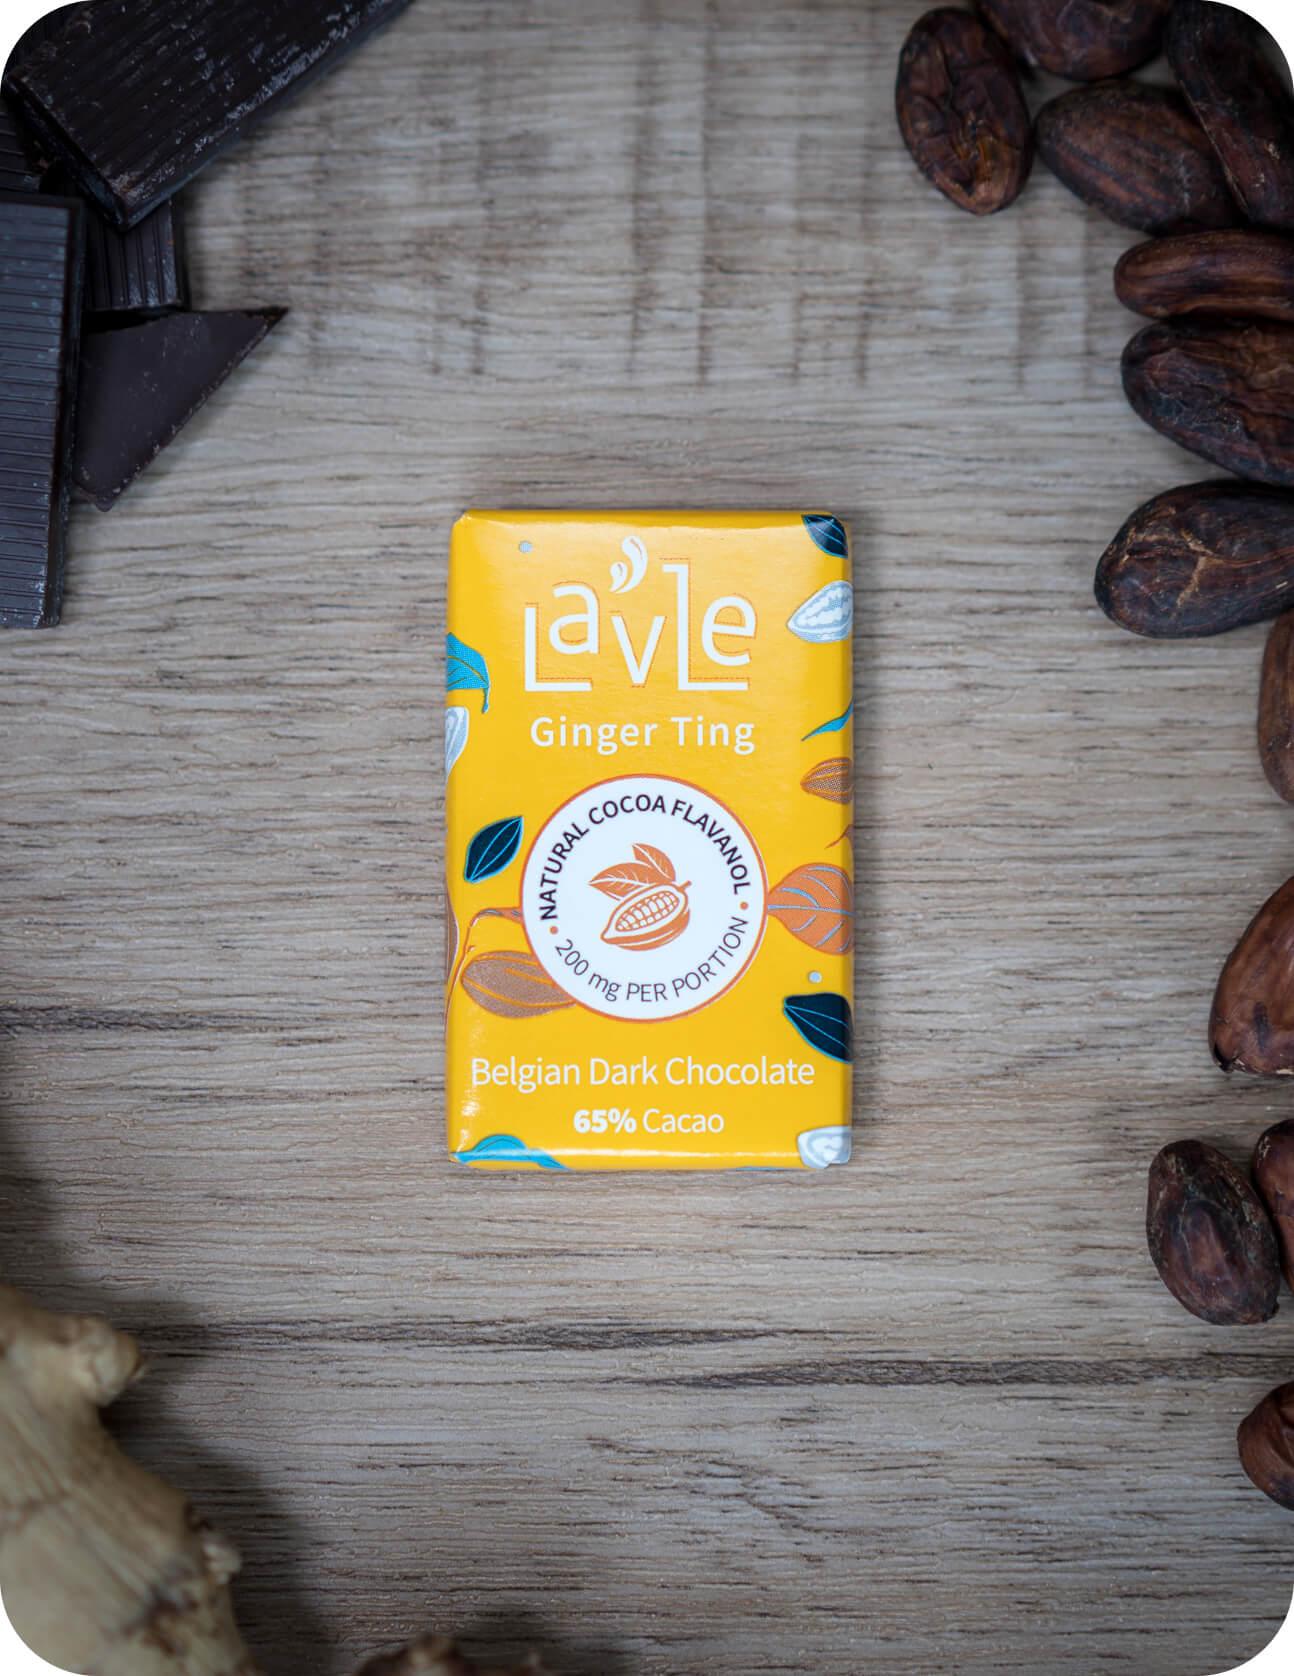 Lavle-Flavanol-Chocolate-Ginger-Ting